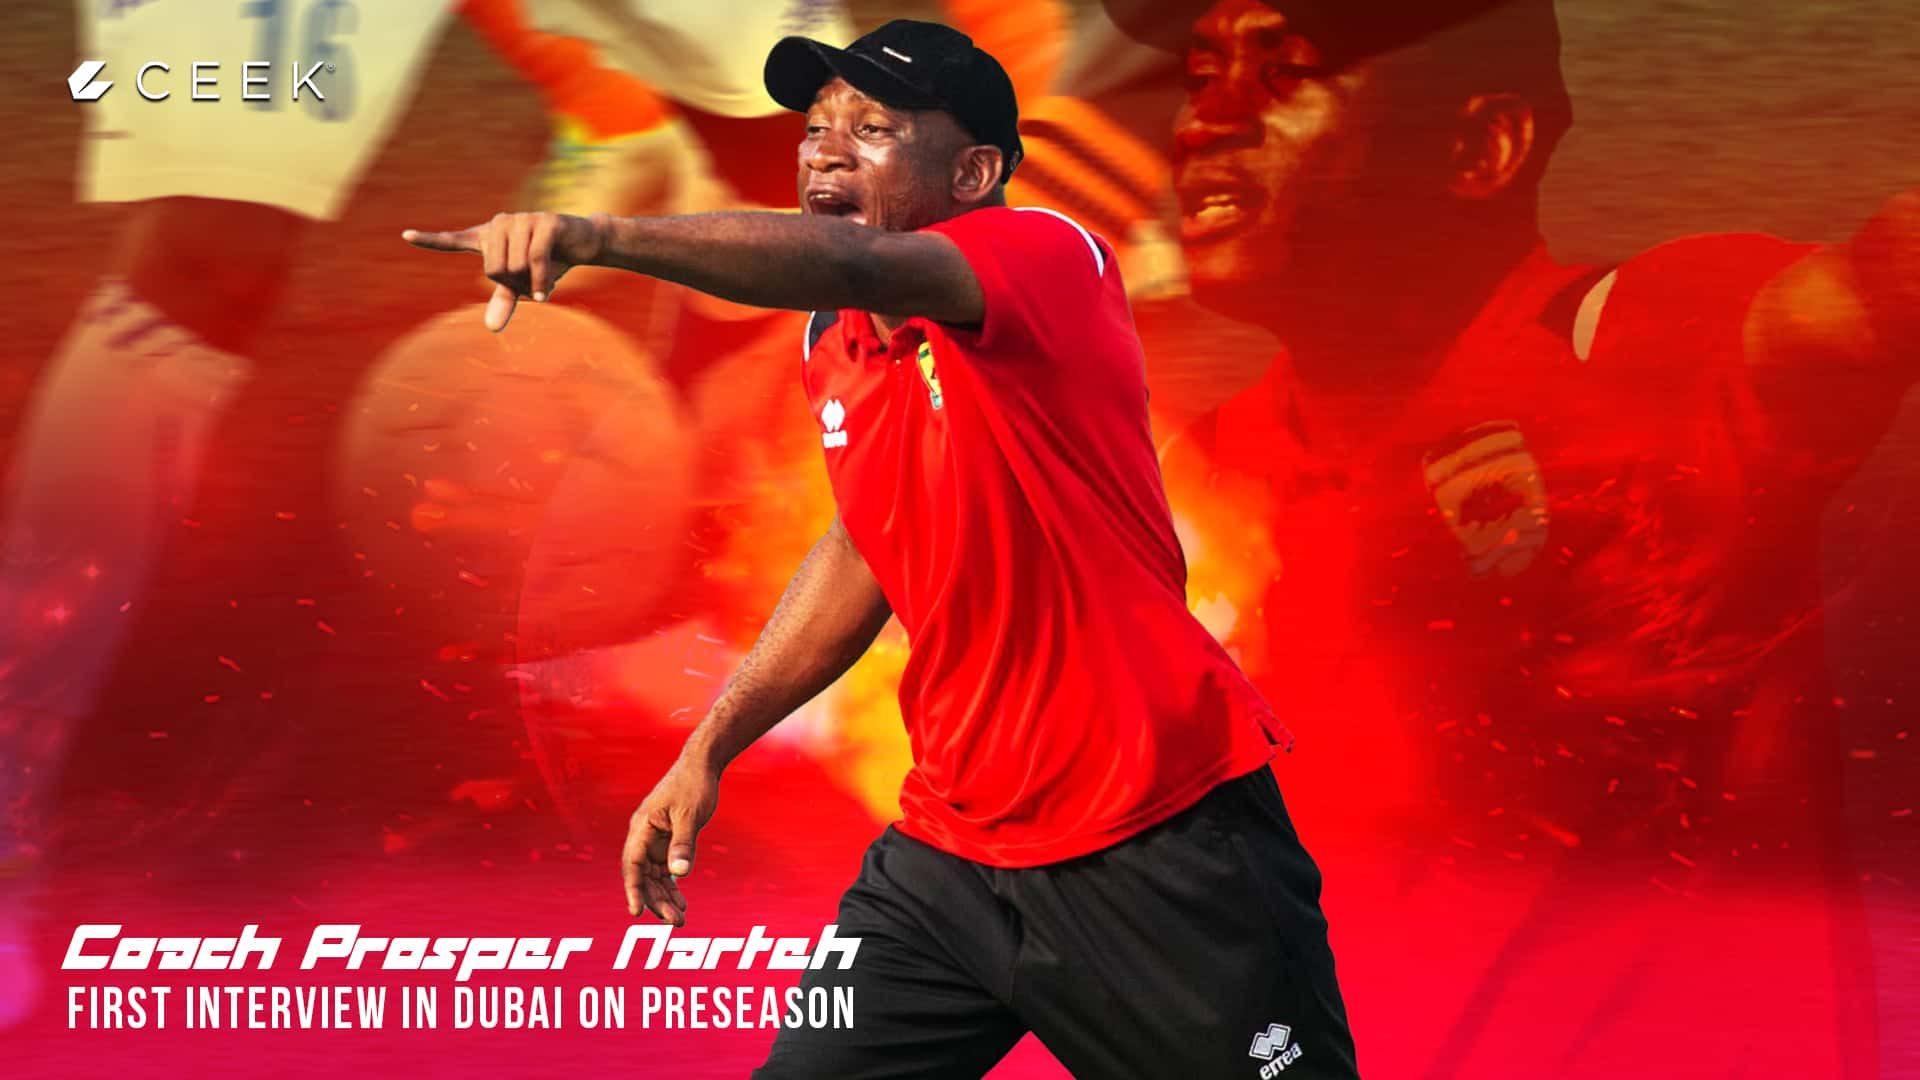 Coach Prosper Narteh first interview in Dubai on preseason ceek.com